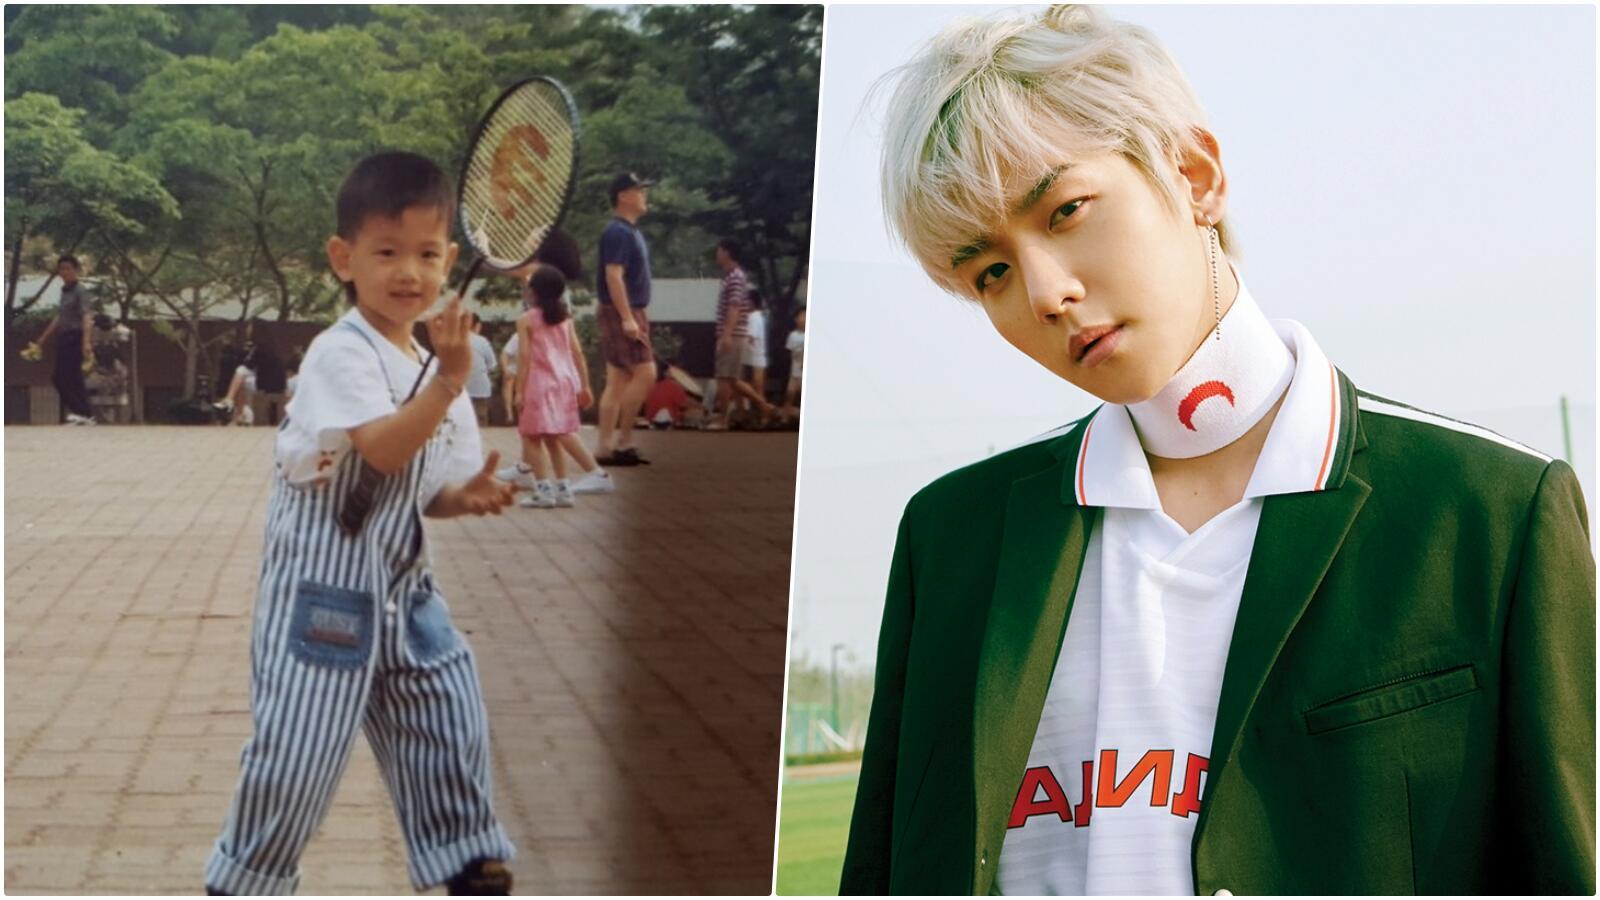 5 Fakta Menarik Baekhyun 'EXO' yang Merayakan Ulang Tahunnya Hari Ini